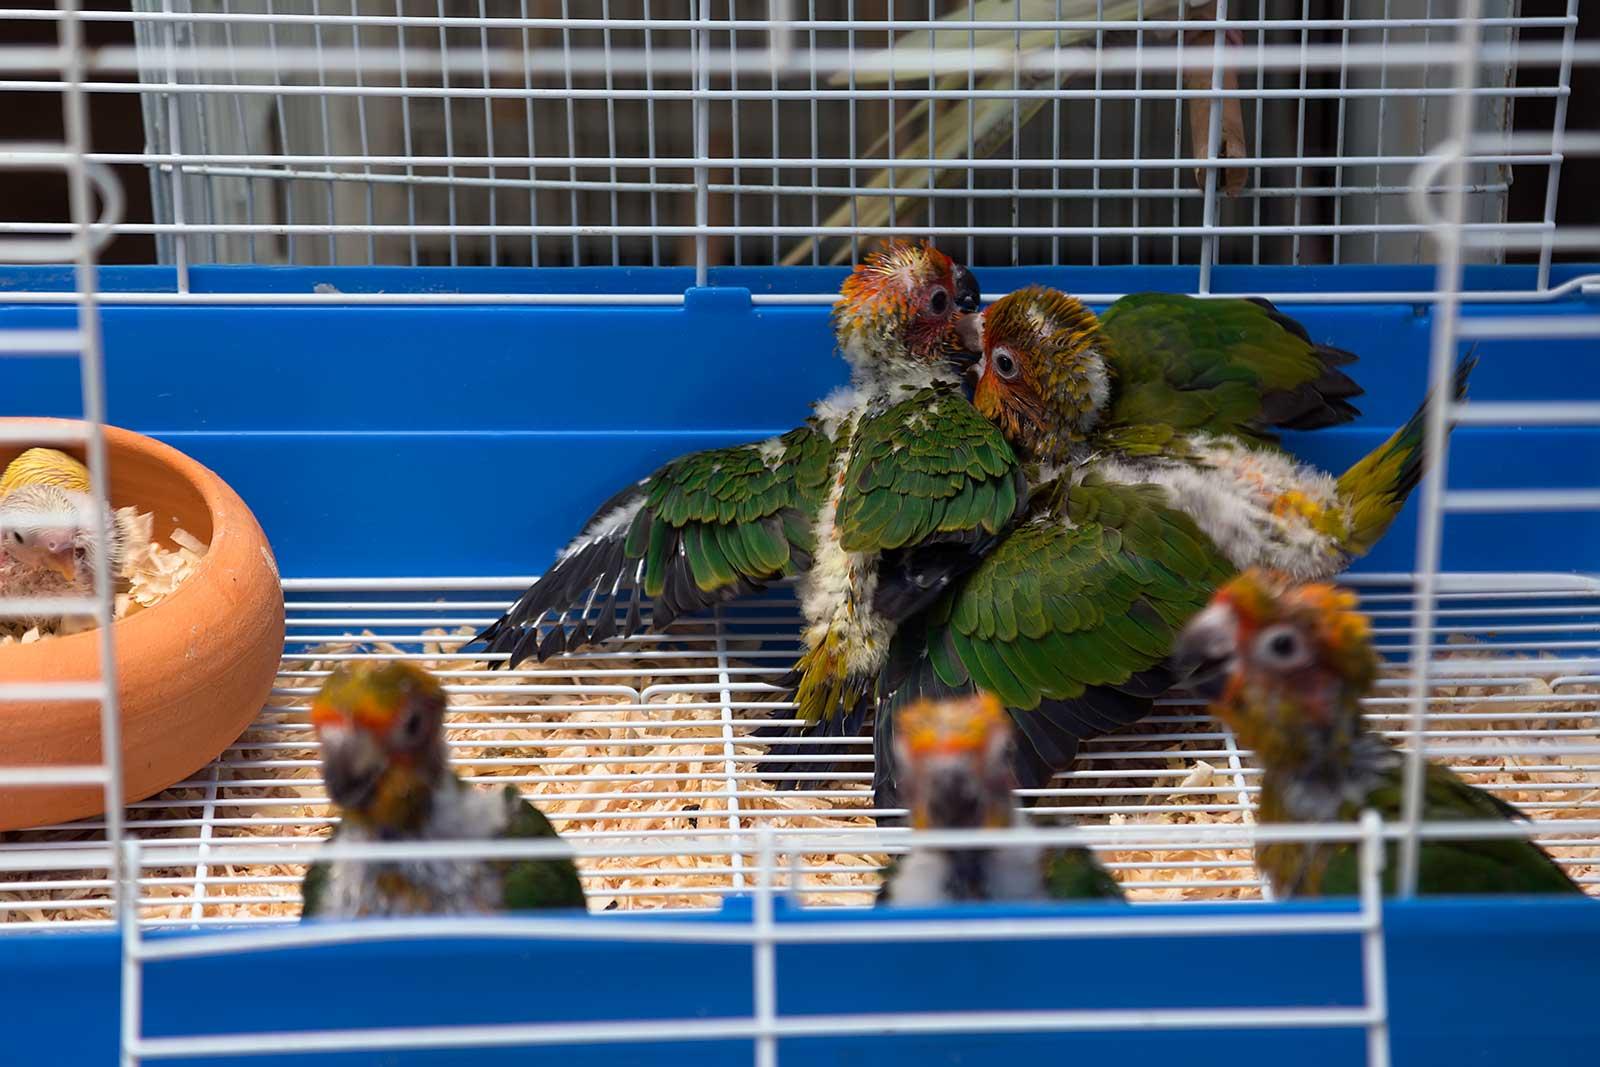 chatuchak-market-cage-pet-section-bangkok-thailand